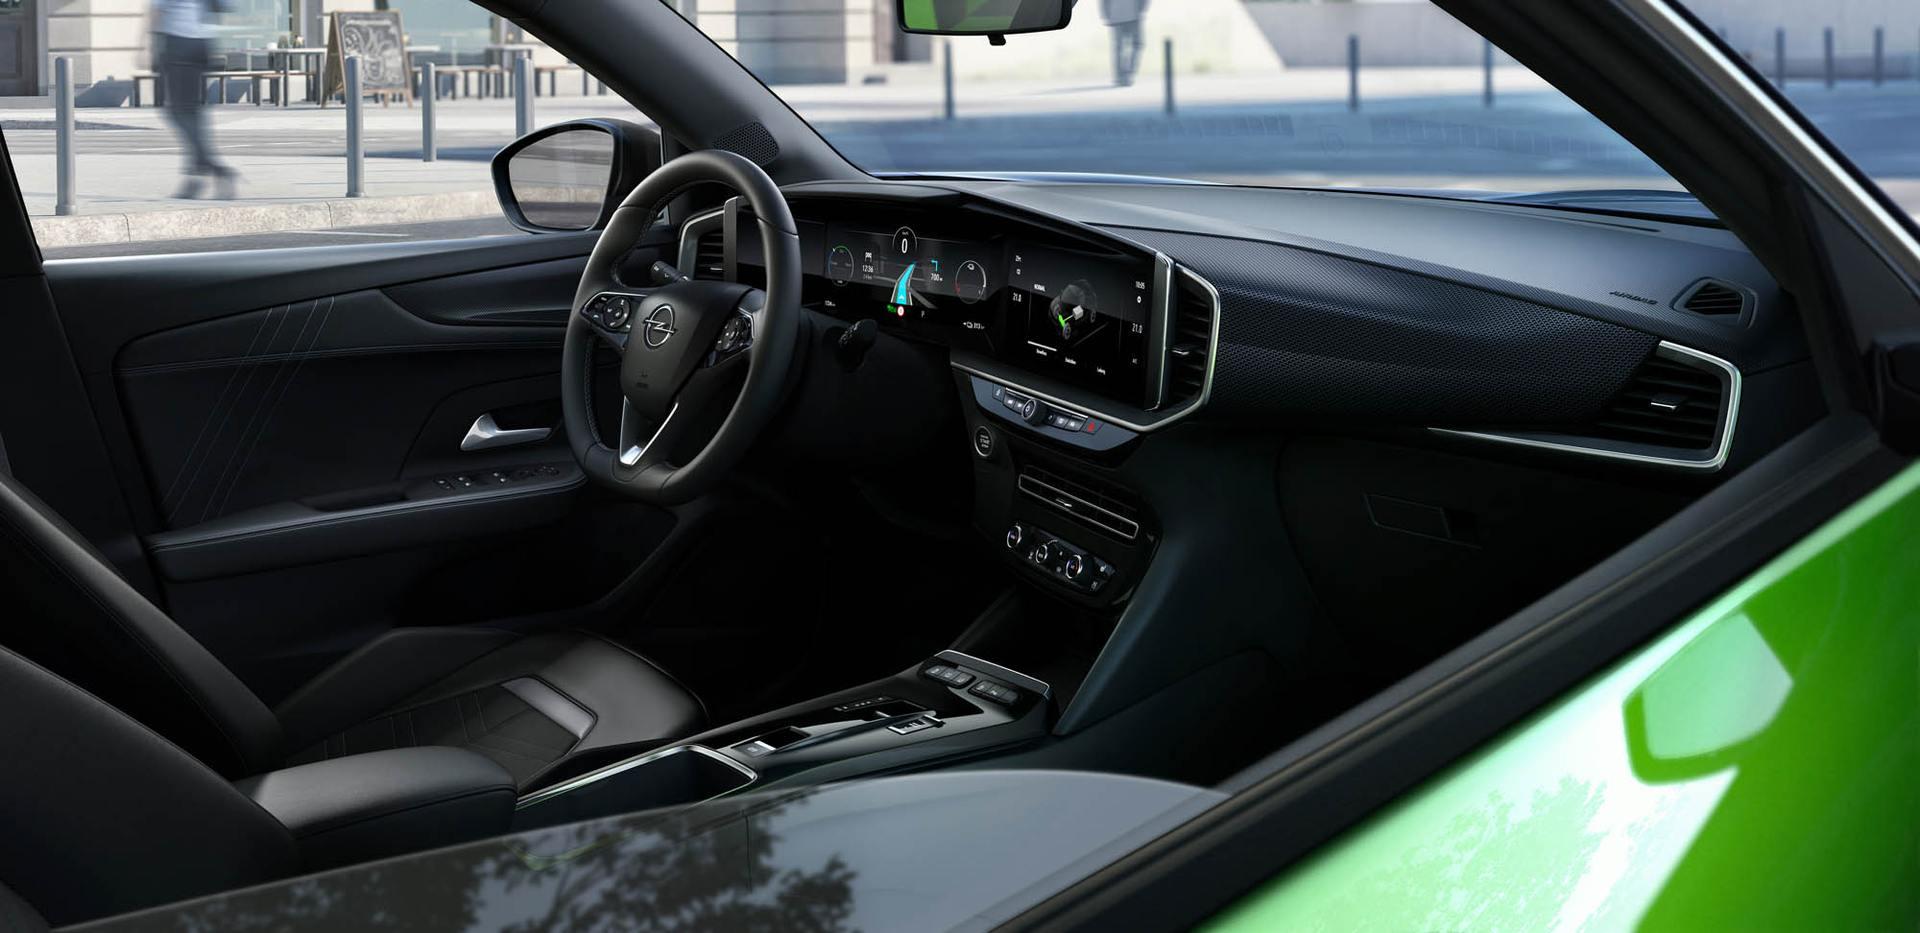 opel mokka 2021 07 - Apple CarPlay og surroundlyd